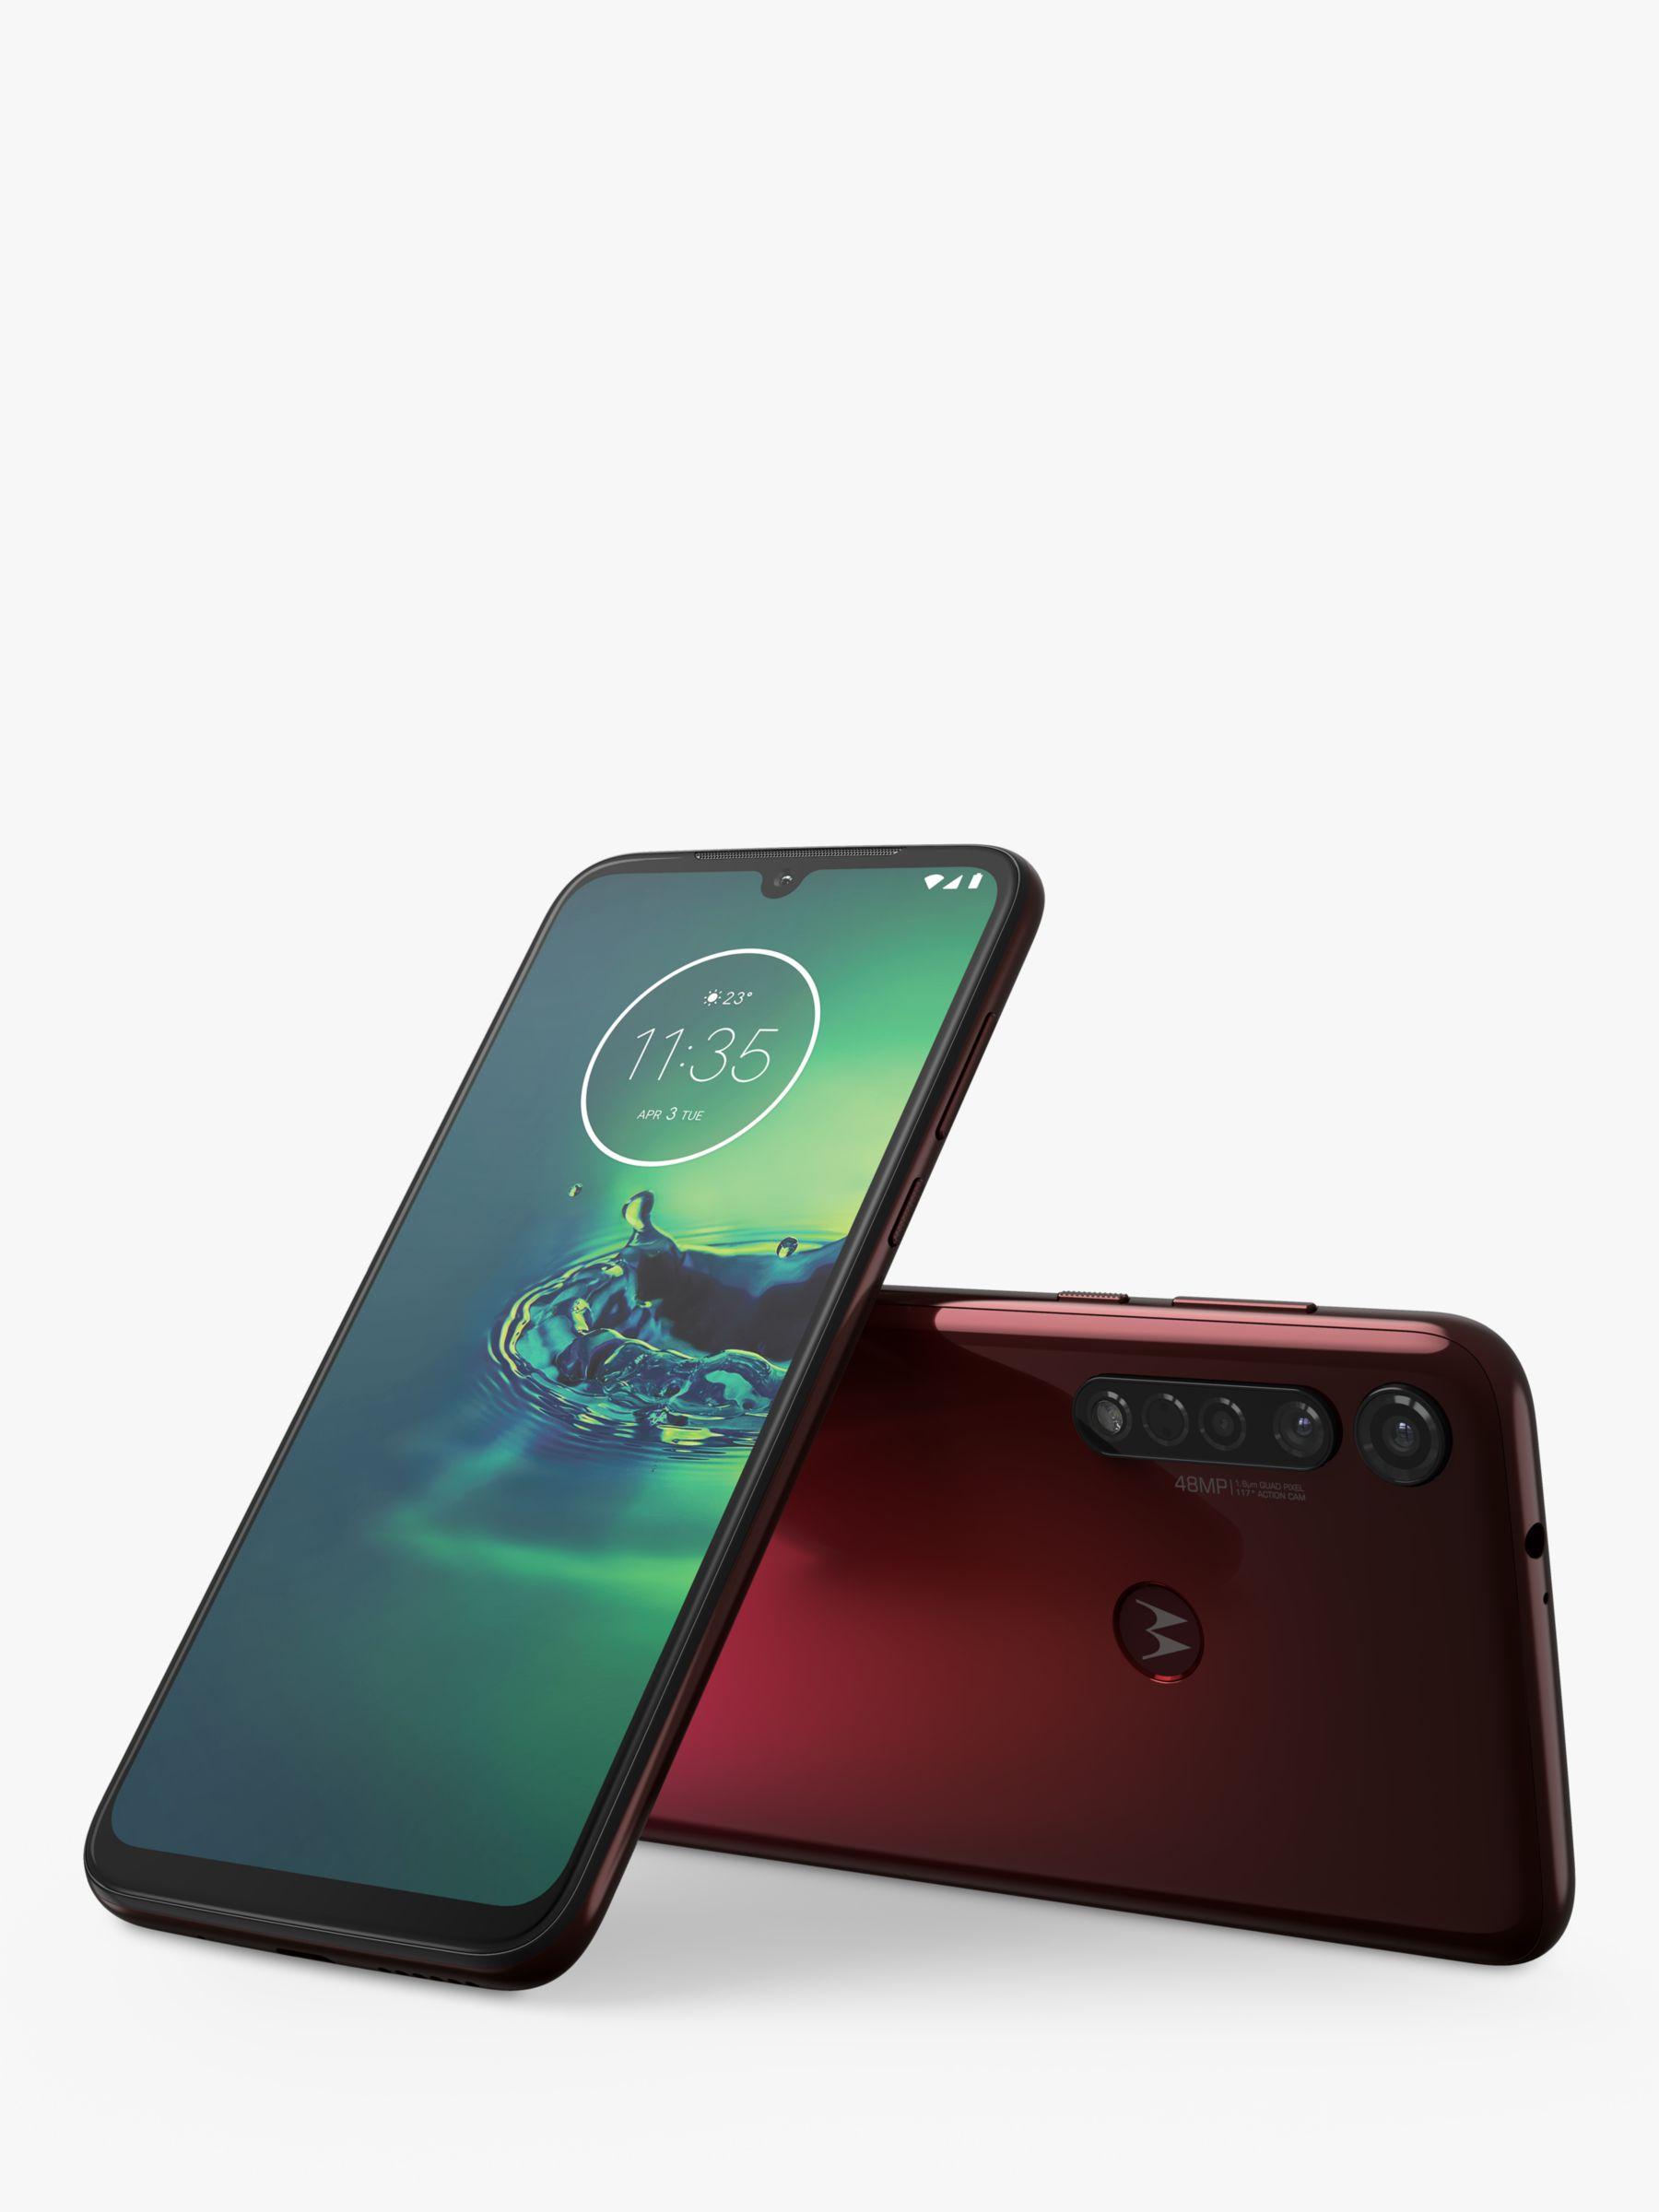 Motorola Motorola g8 Plus Smartphone, Android, 6.2, 4G LTE, SIM Free, 64GB, Crystal Pink